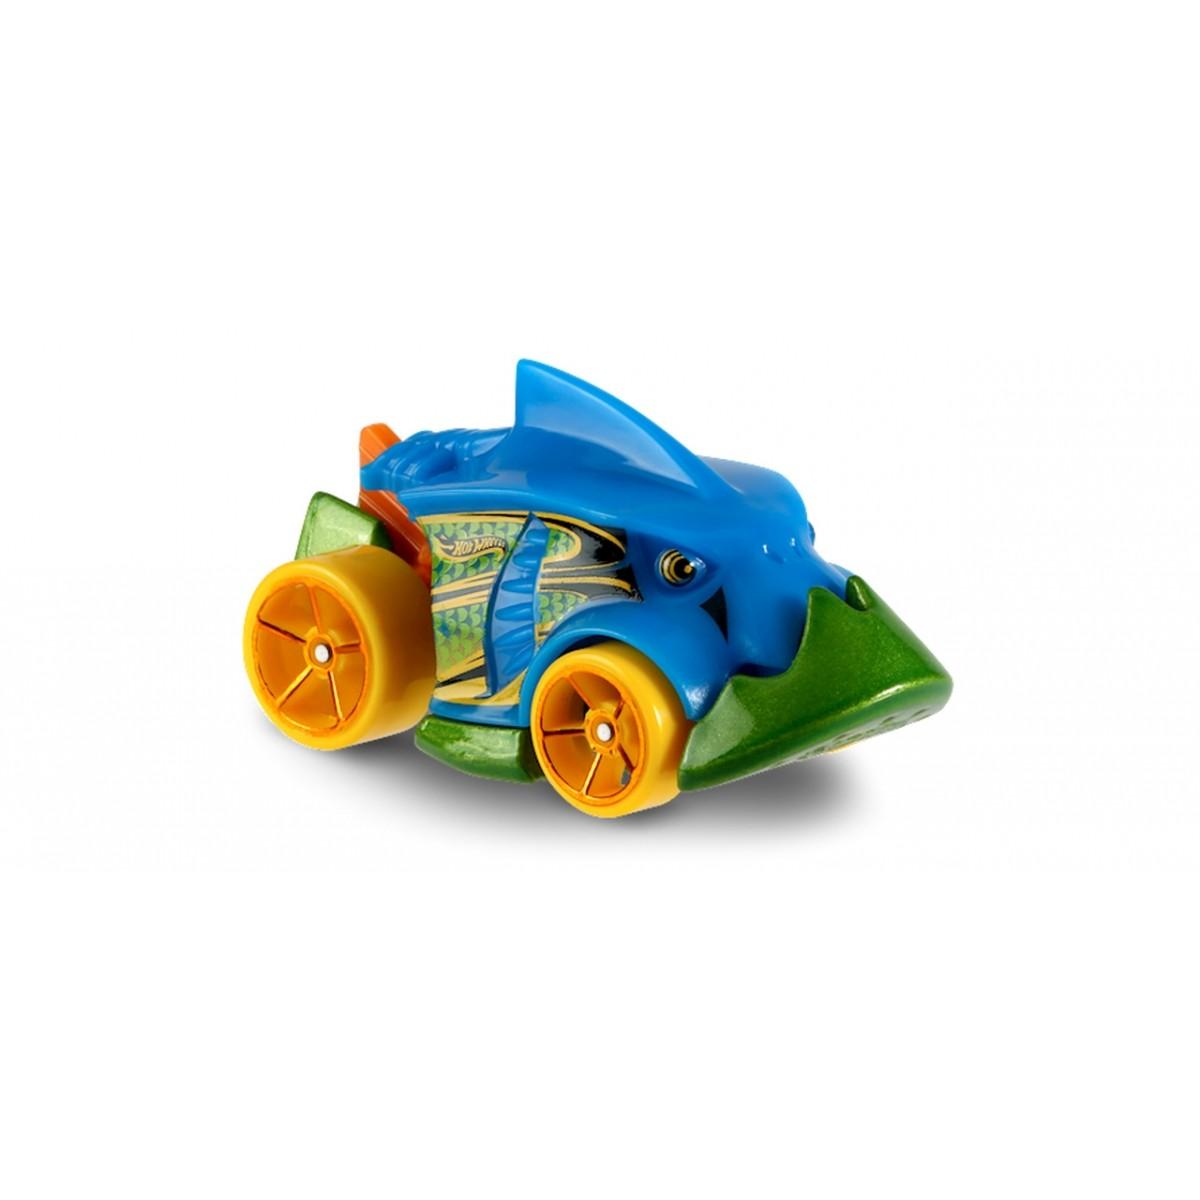 Carrinho Hot Wheels: Piranha Terror Azul